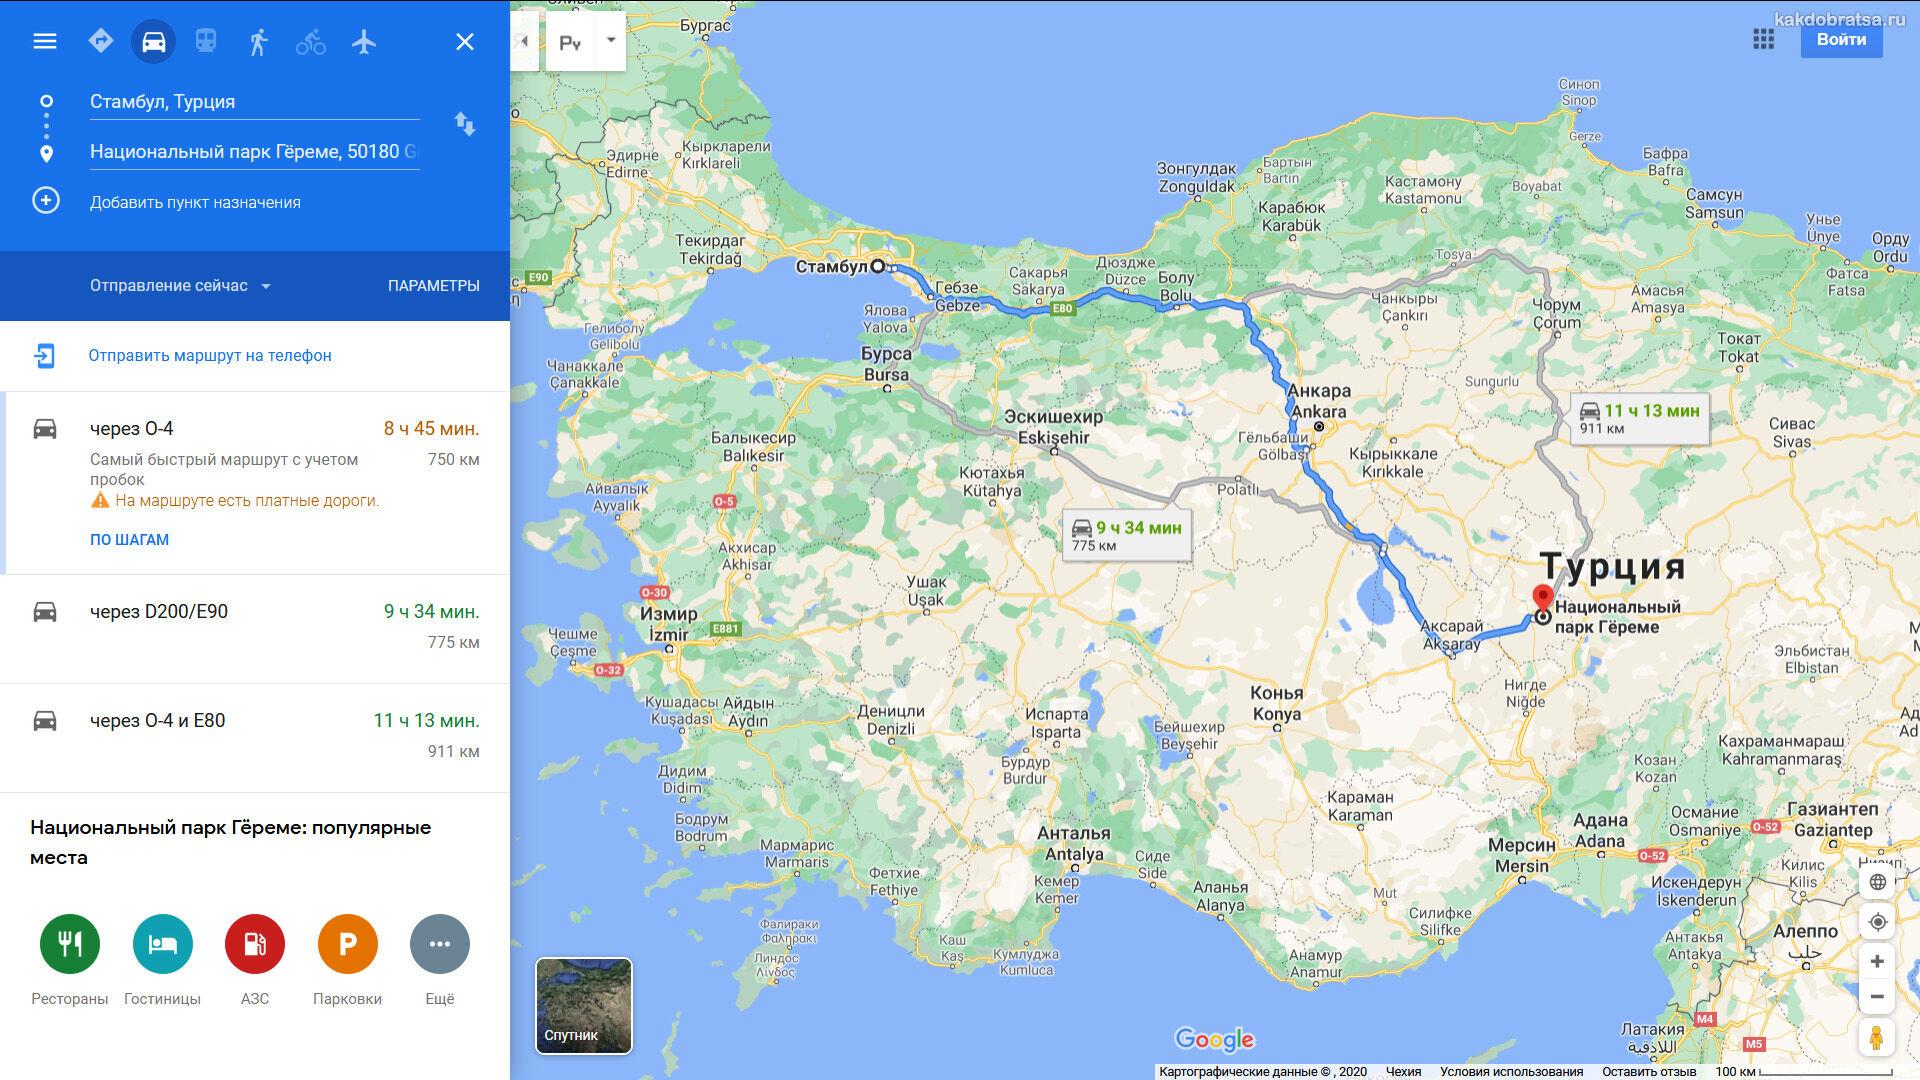 Расстояние Стамбул Каппадокия по карте